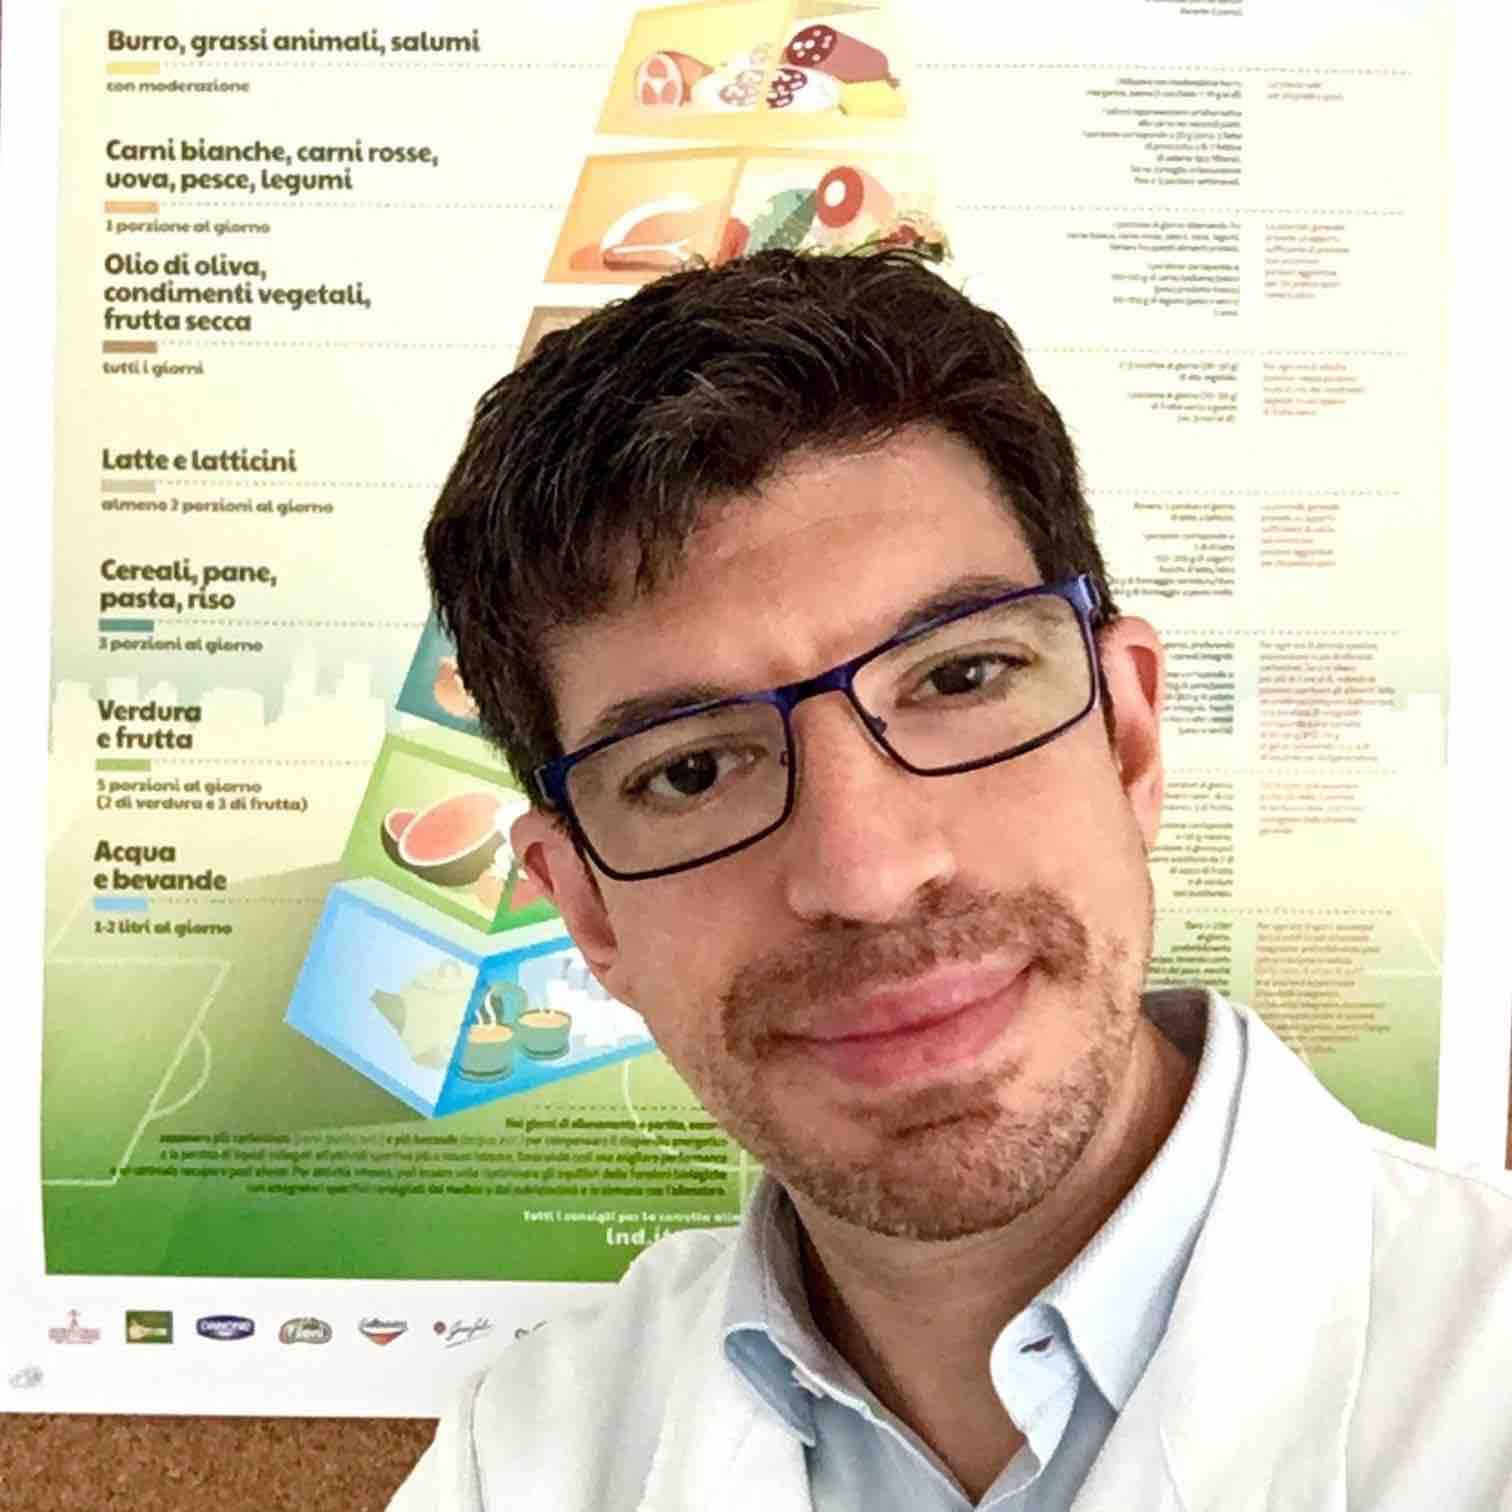 Dott.Emanuele Rondina